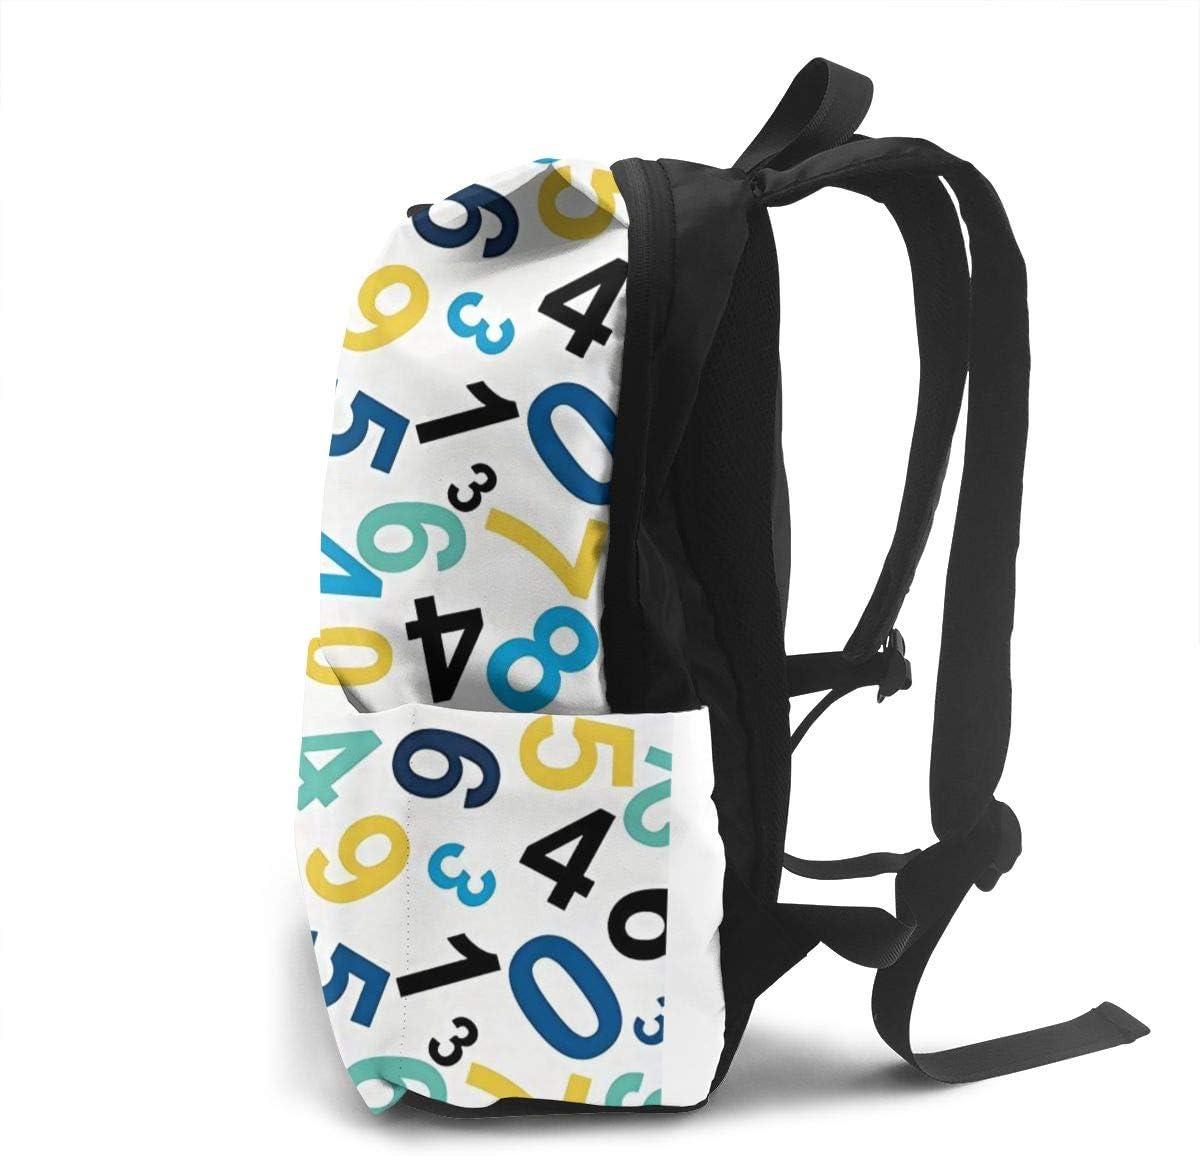 Number Seamless Pattern Backpack,Ultralight Foldable Packable Backpacks Lightweight Backpack Bag for School